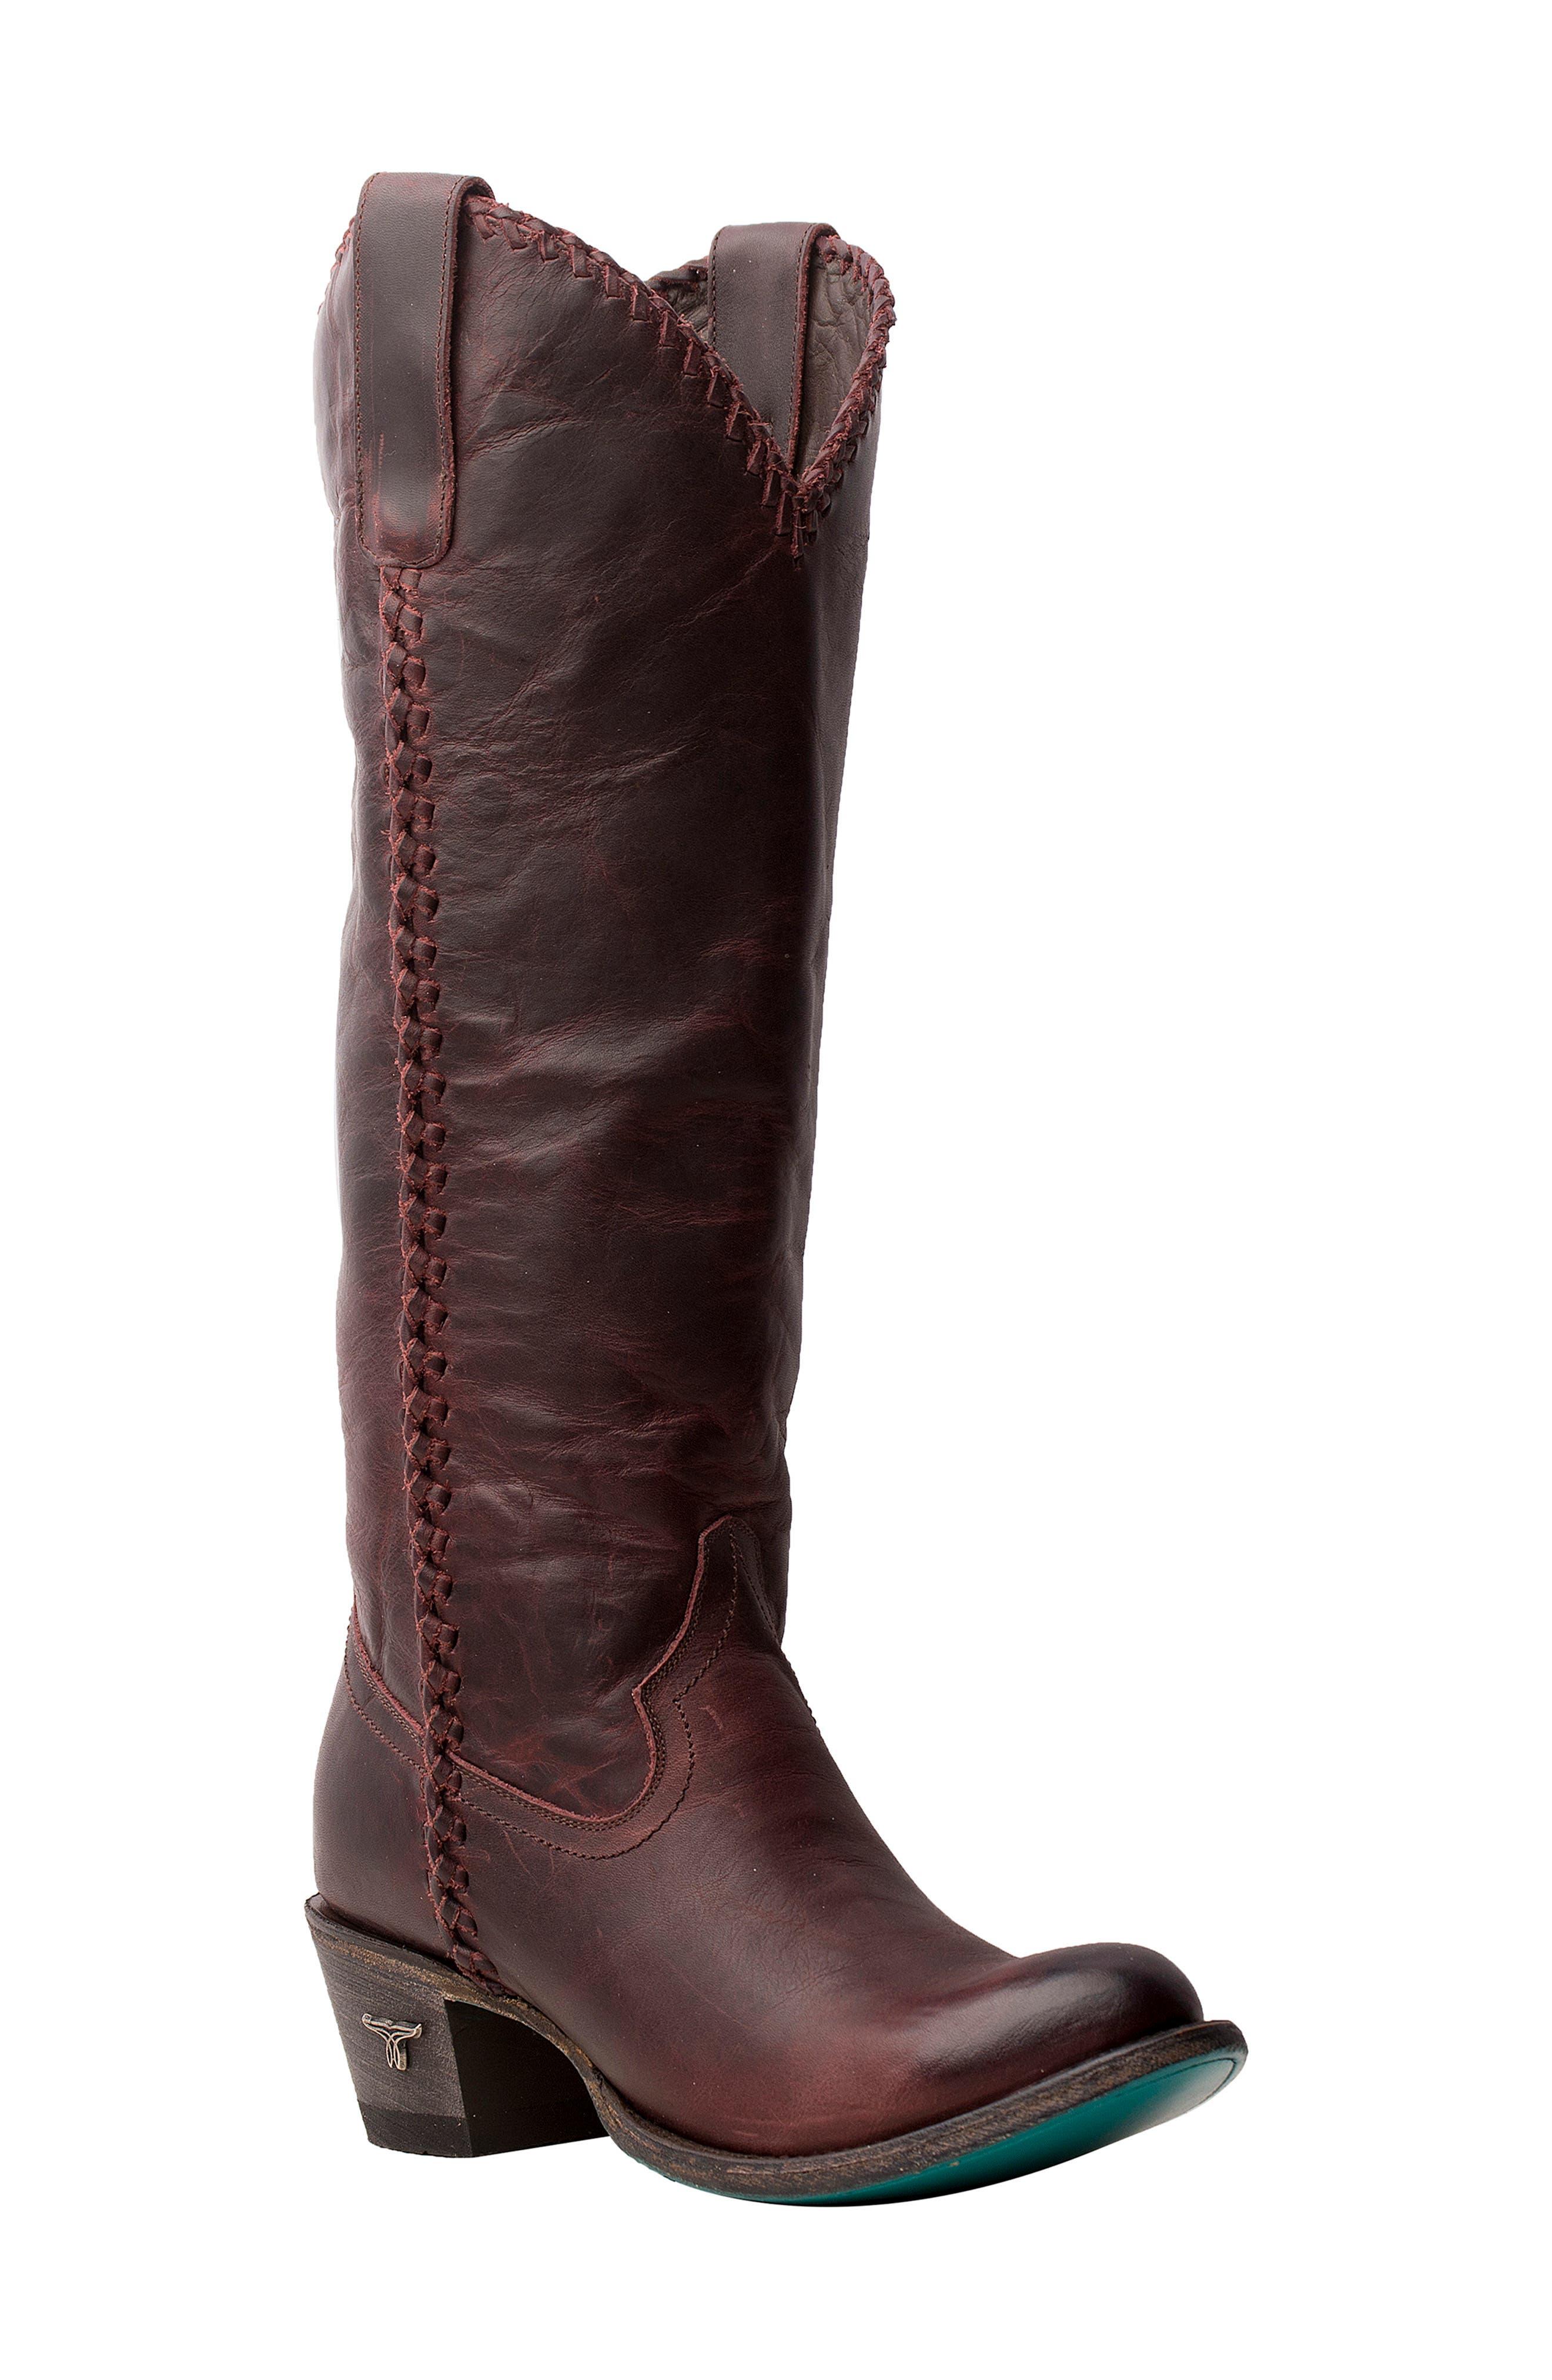 Plain Jane Knee High Western Boot